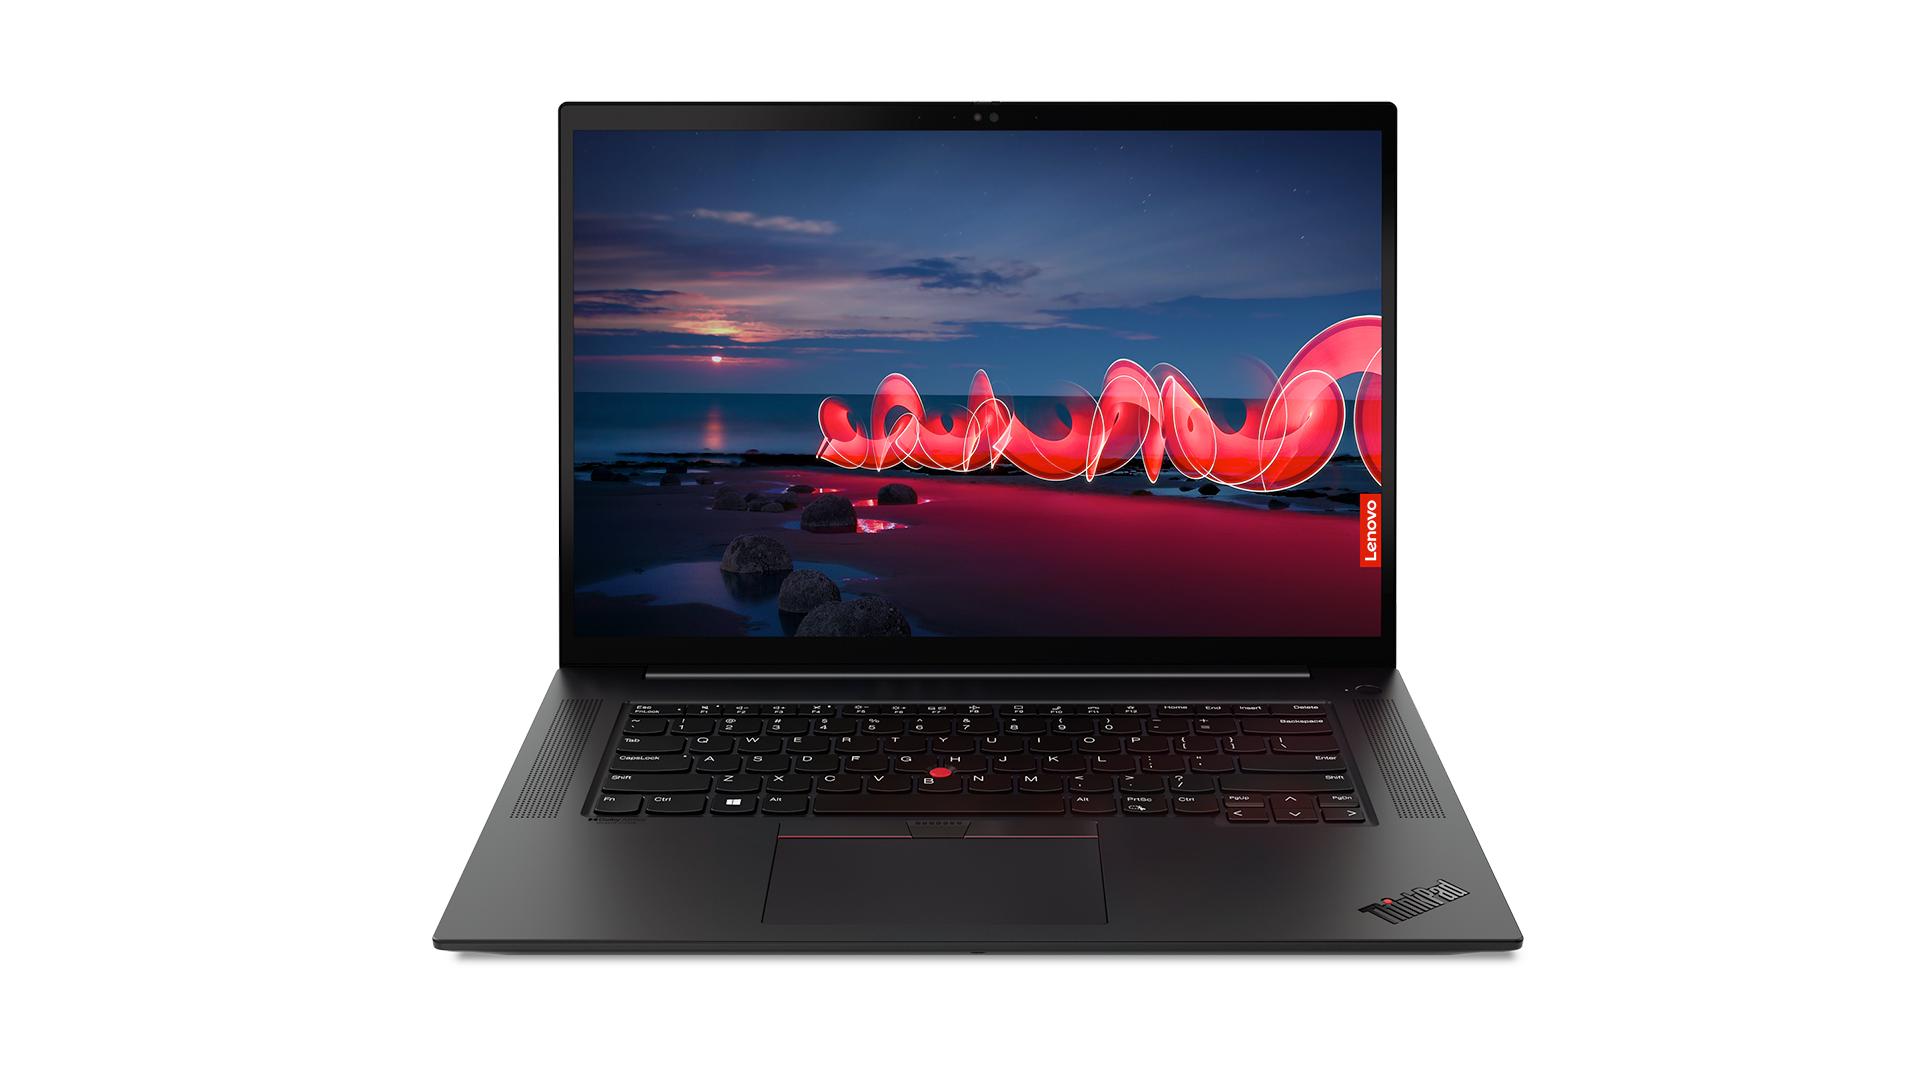 The ThinkPad X1 Extreme